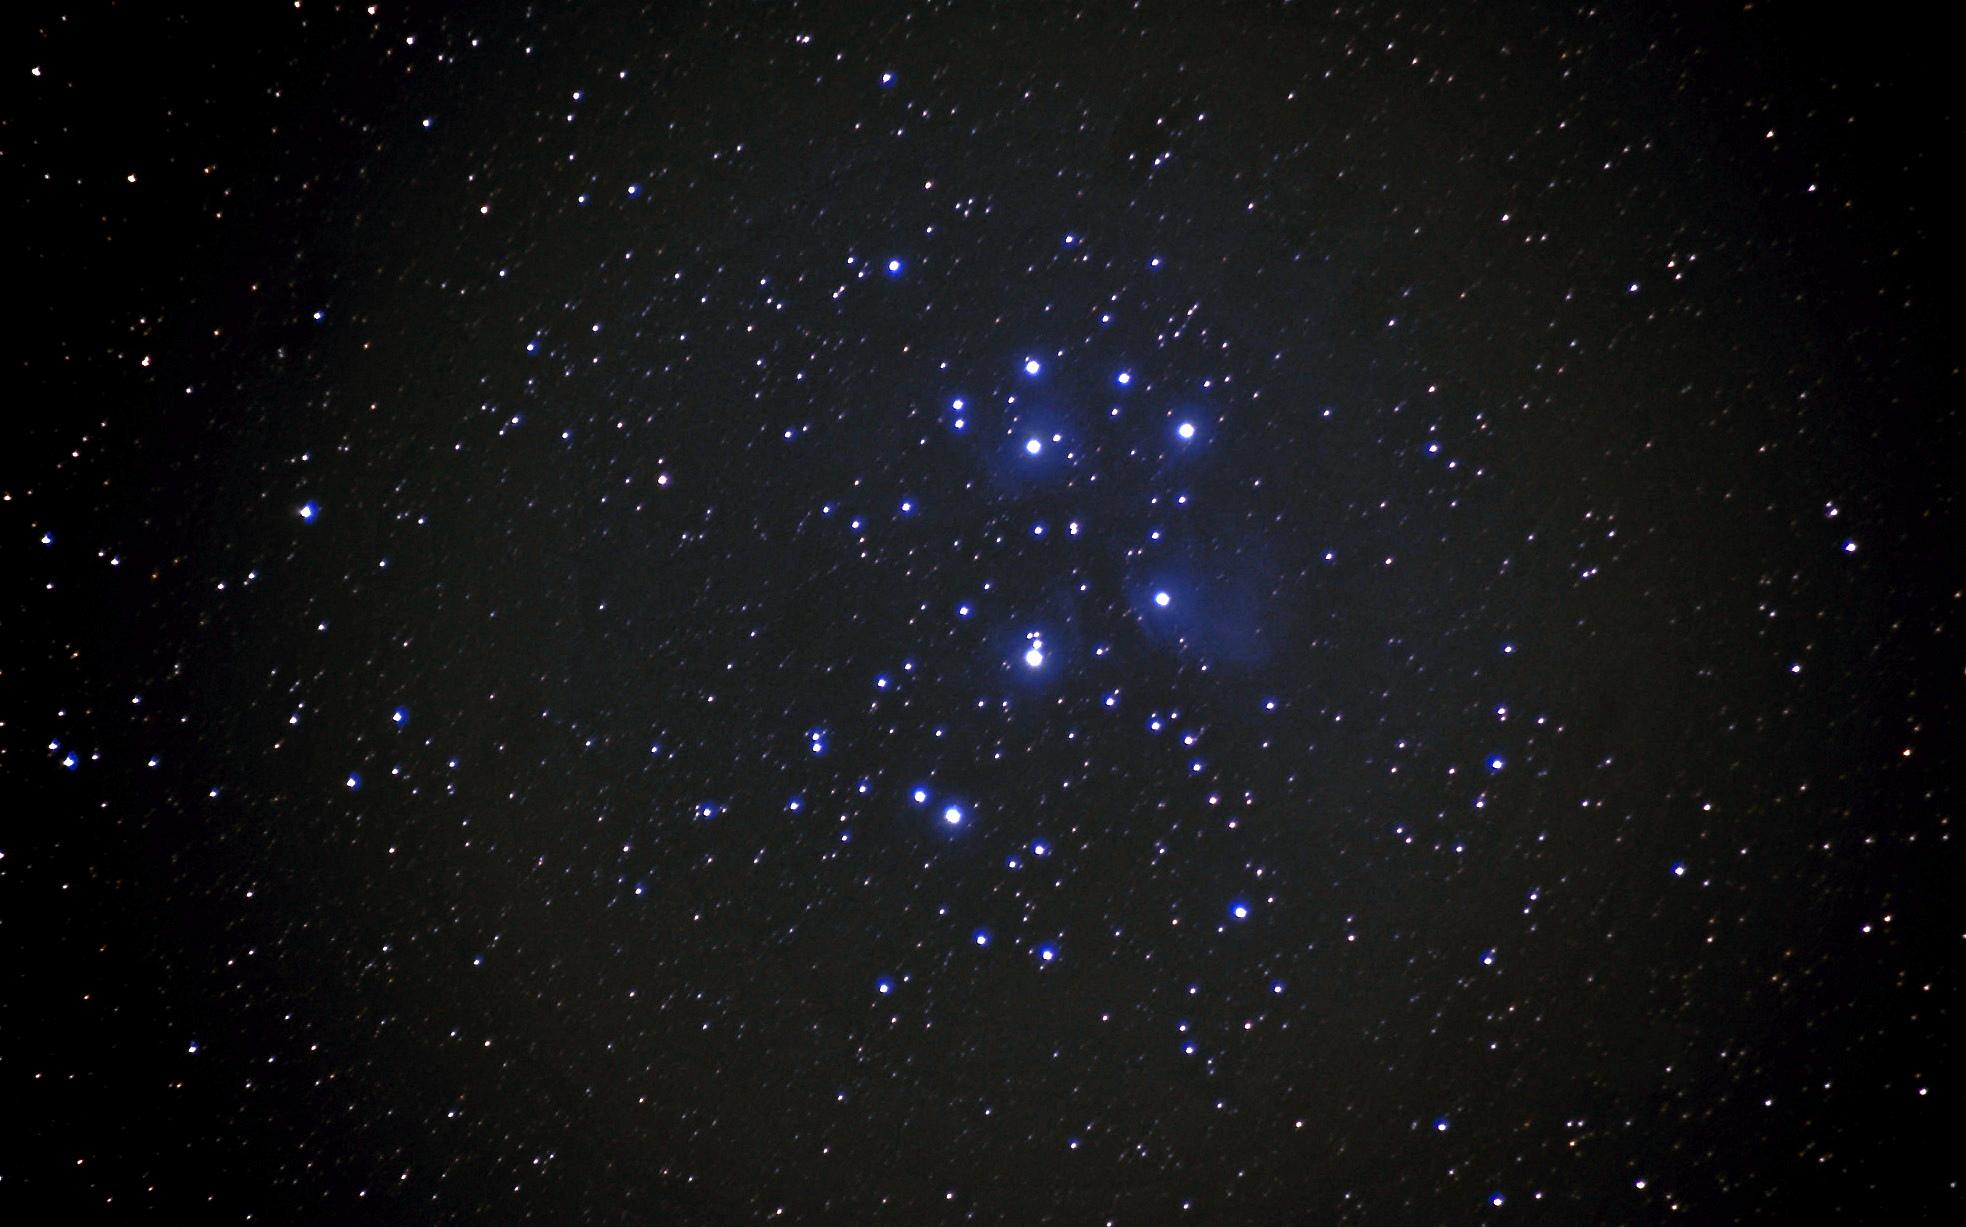 M45def.jpg.af1d1e84ed51e3264f1c901a785c34a5 4.jpg